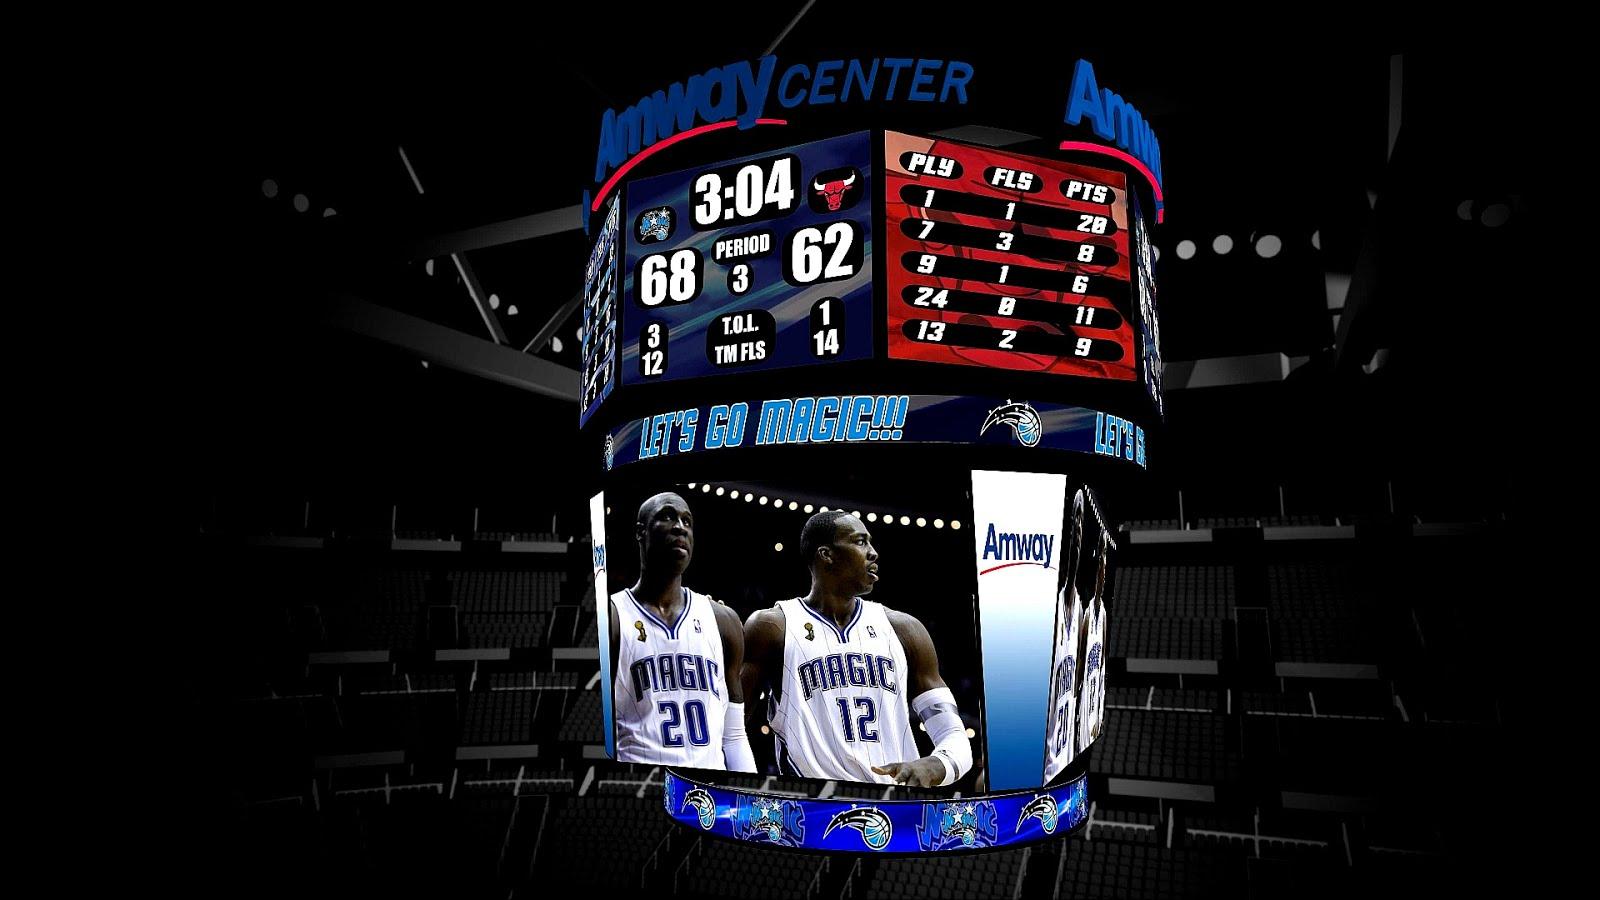 Scoreboard - Nba Basketball Scoreboard - Basketball Choices